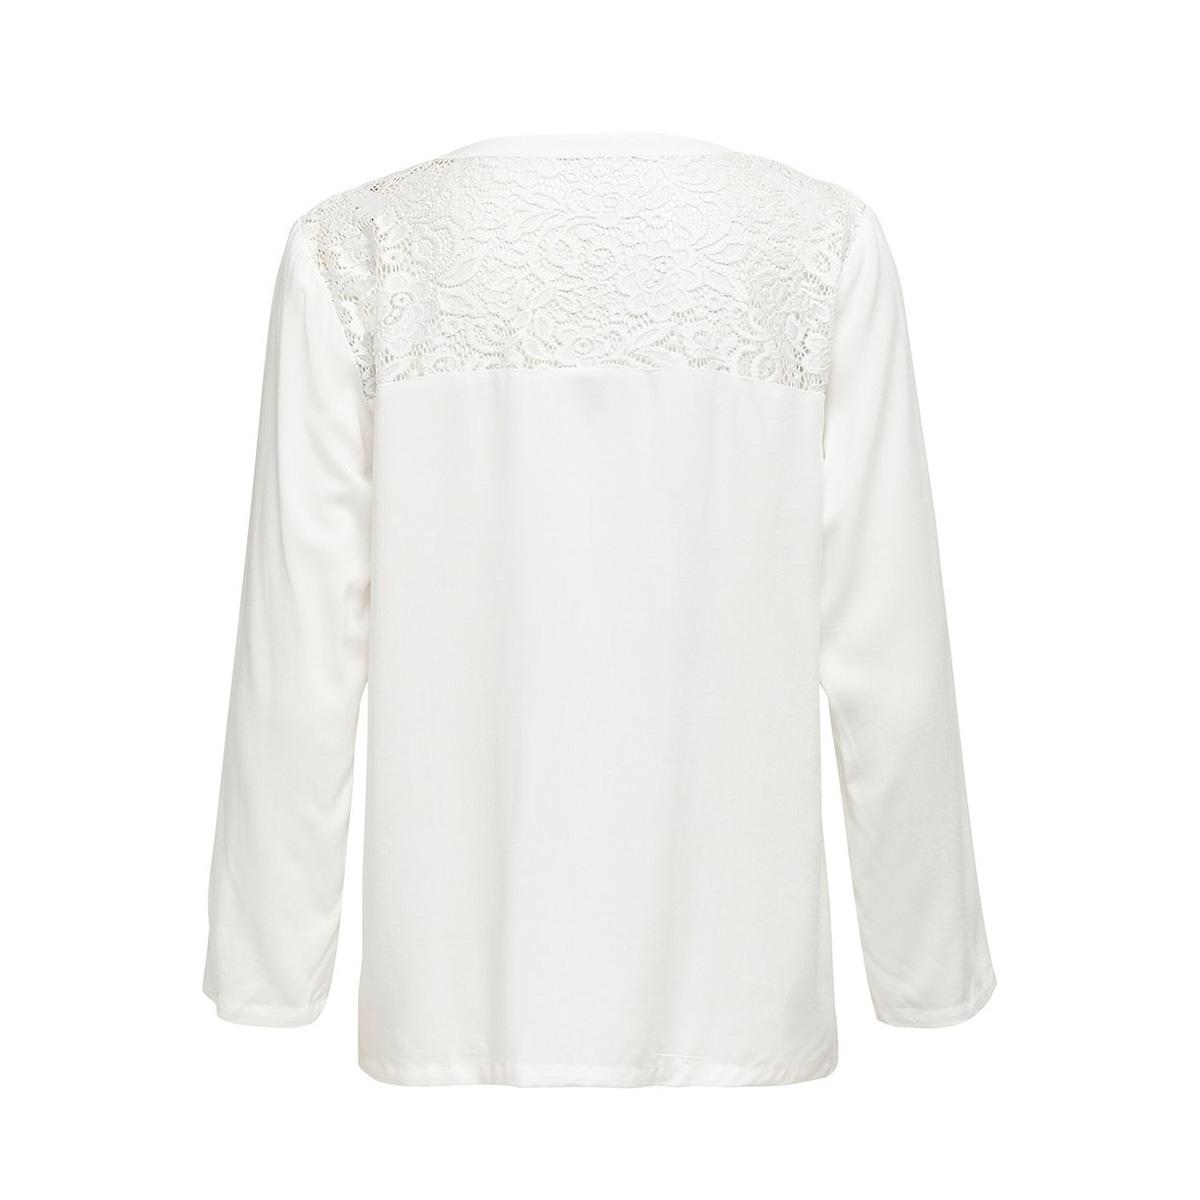 jdyraymond 7/8  lace top wvn noos 15194025 jacqueline de yong t-shirt cloud dancer